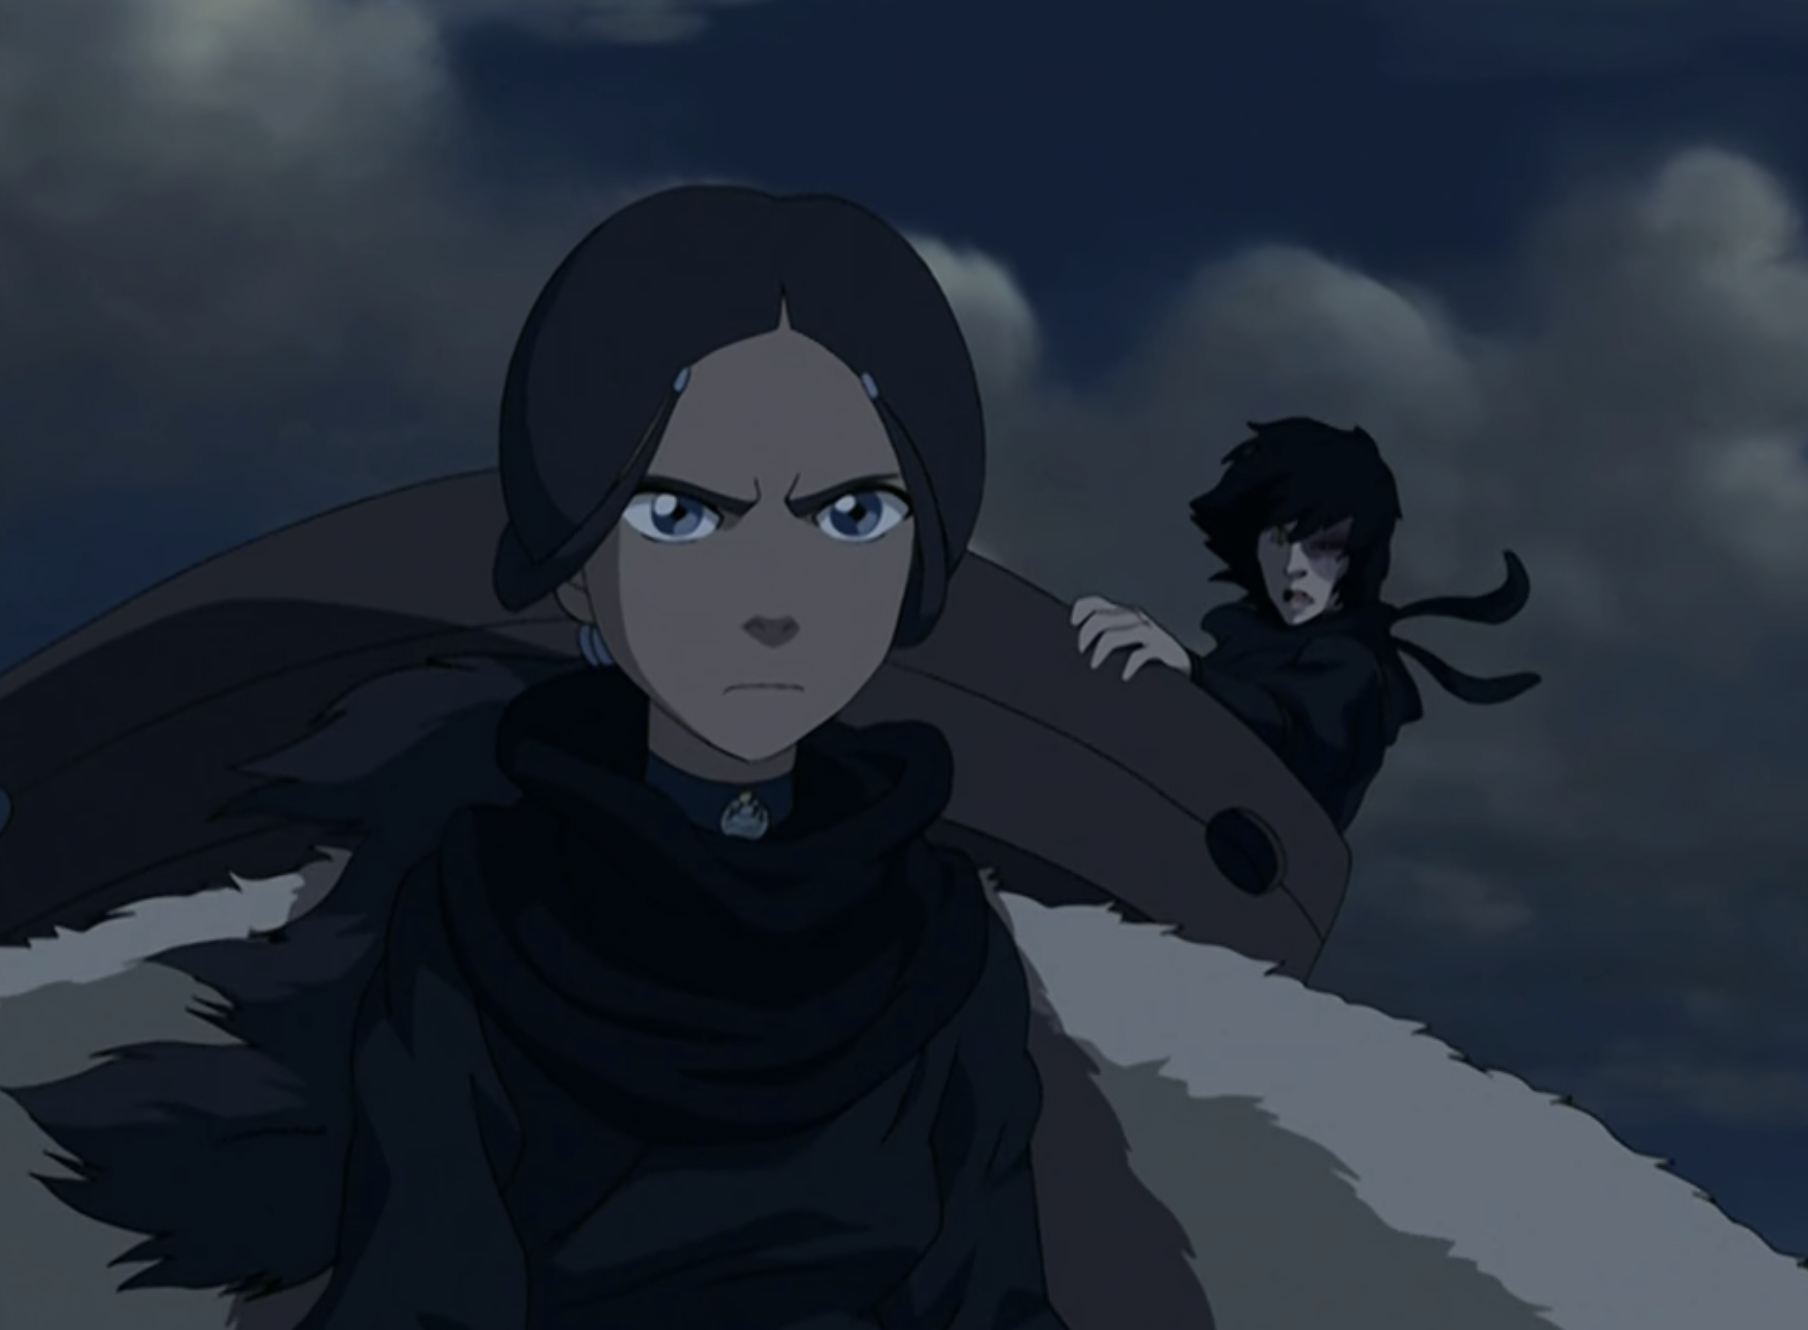 Katara and Zuko traveling together on Appa, the sky bison.